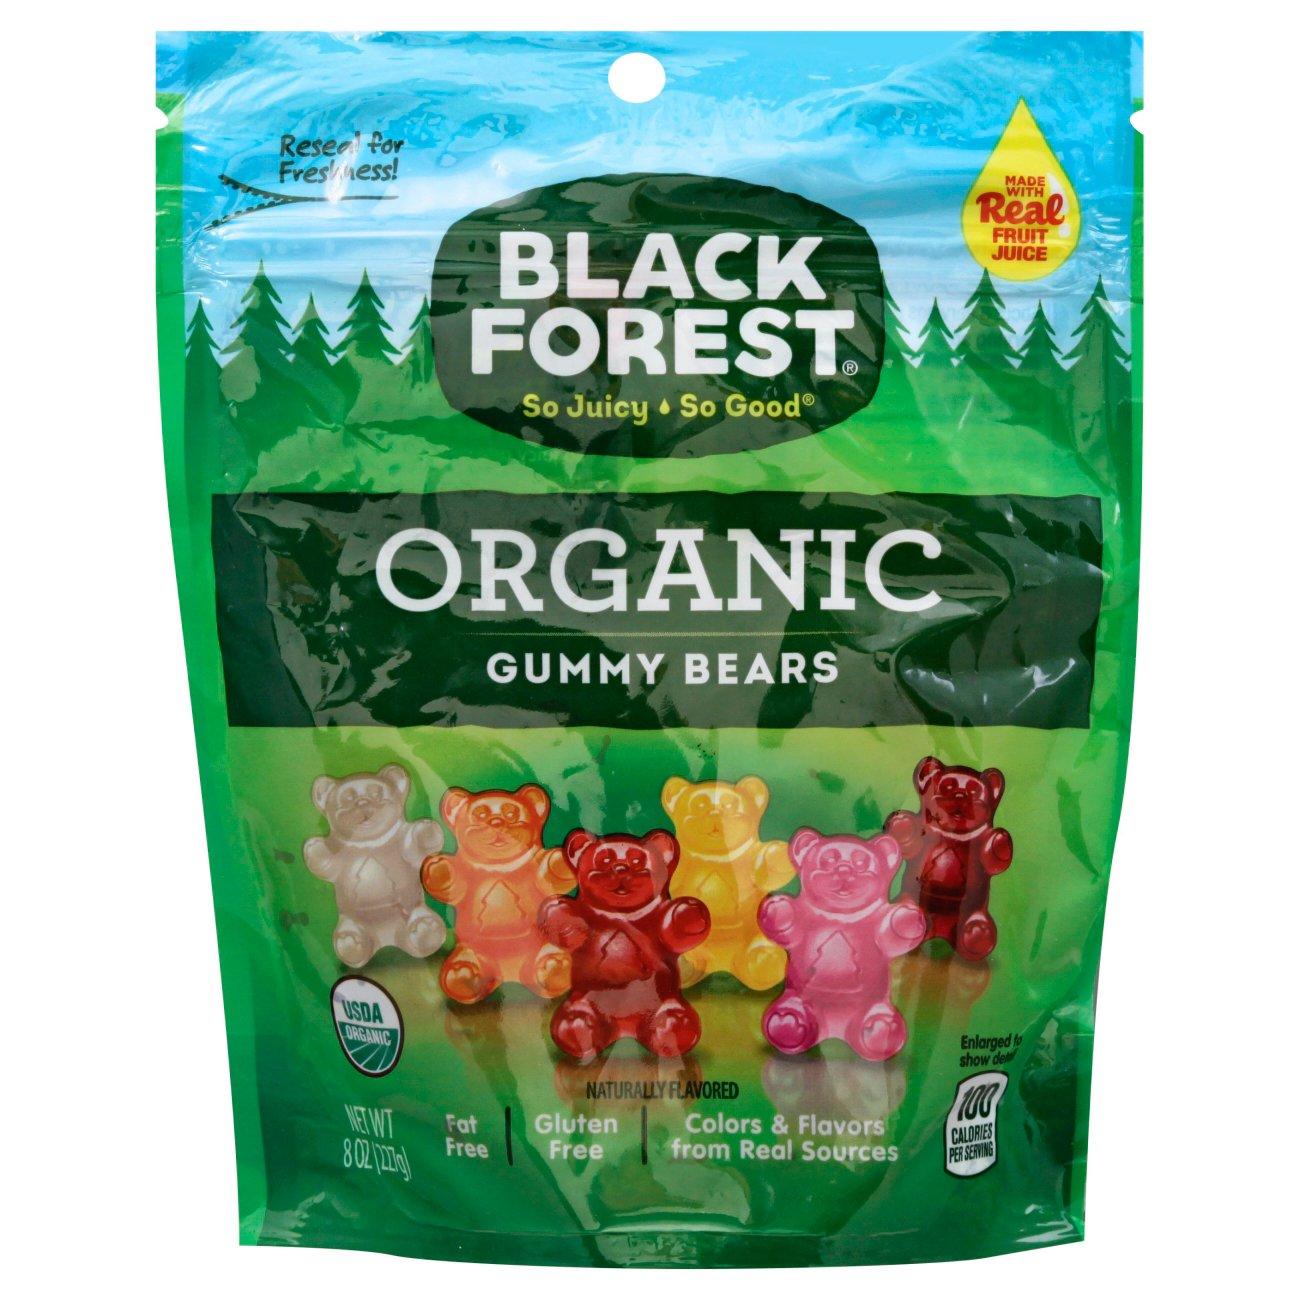 Black Forest Organic Gummy Bears ‑ Shop